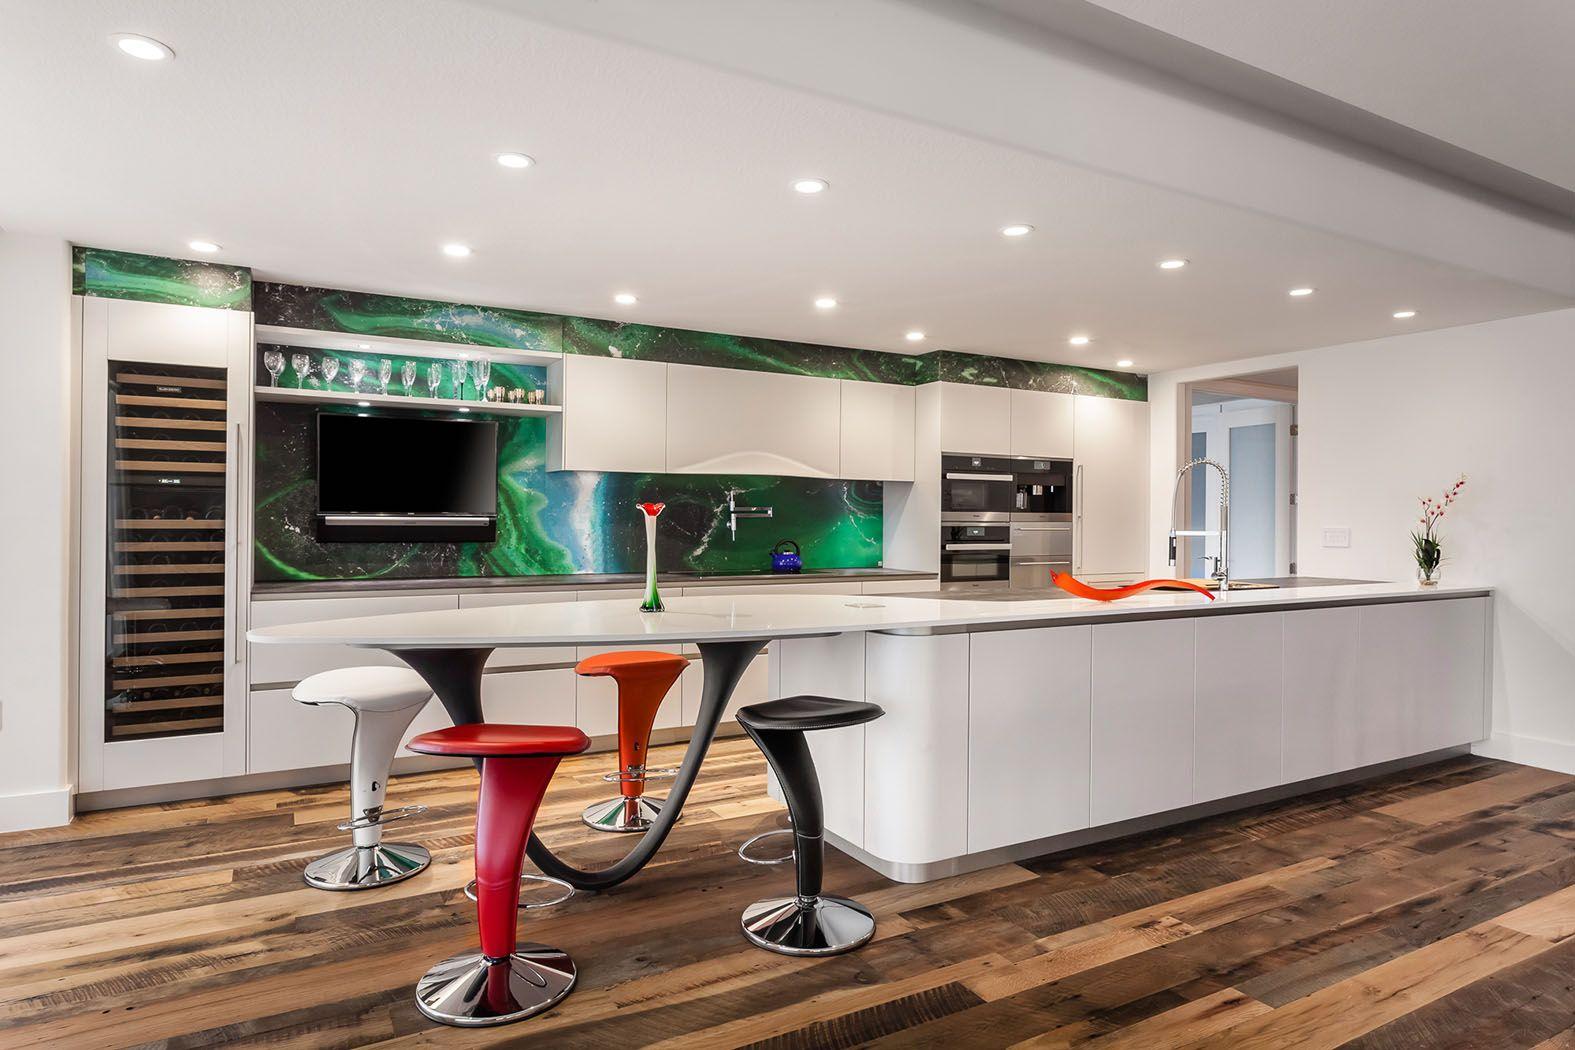 An Ultra Modern Kitchen Collaboration Between 2 Italian Design Giants Snaidero And Alex Turco